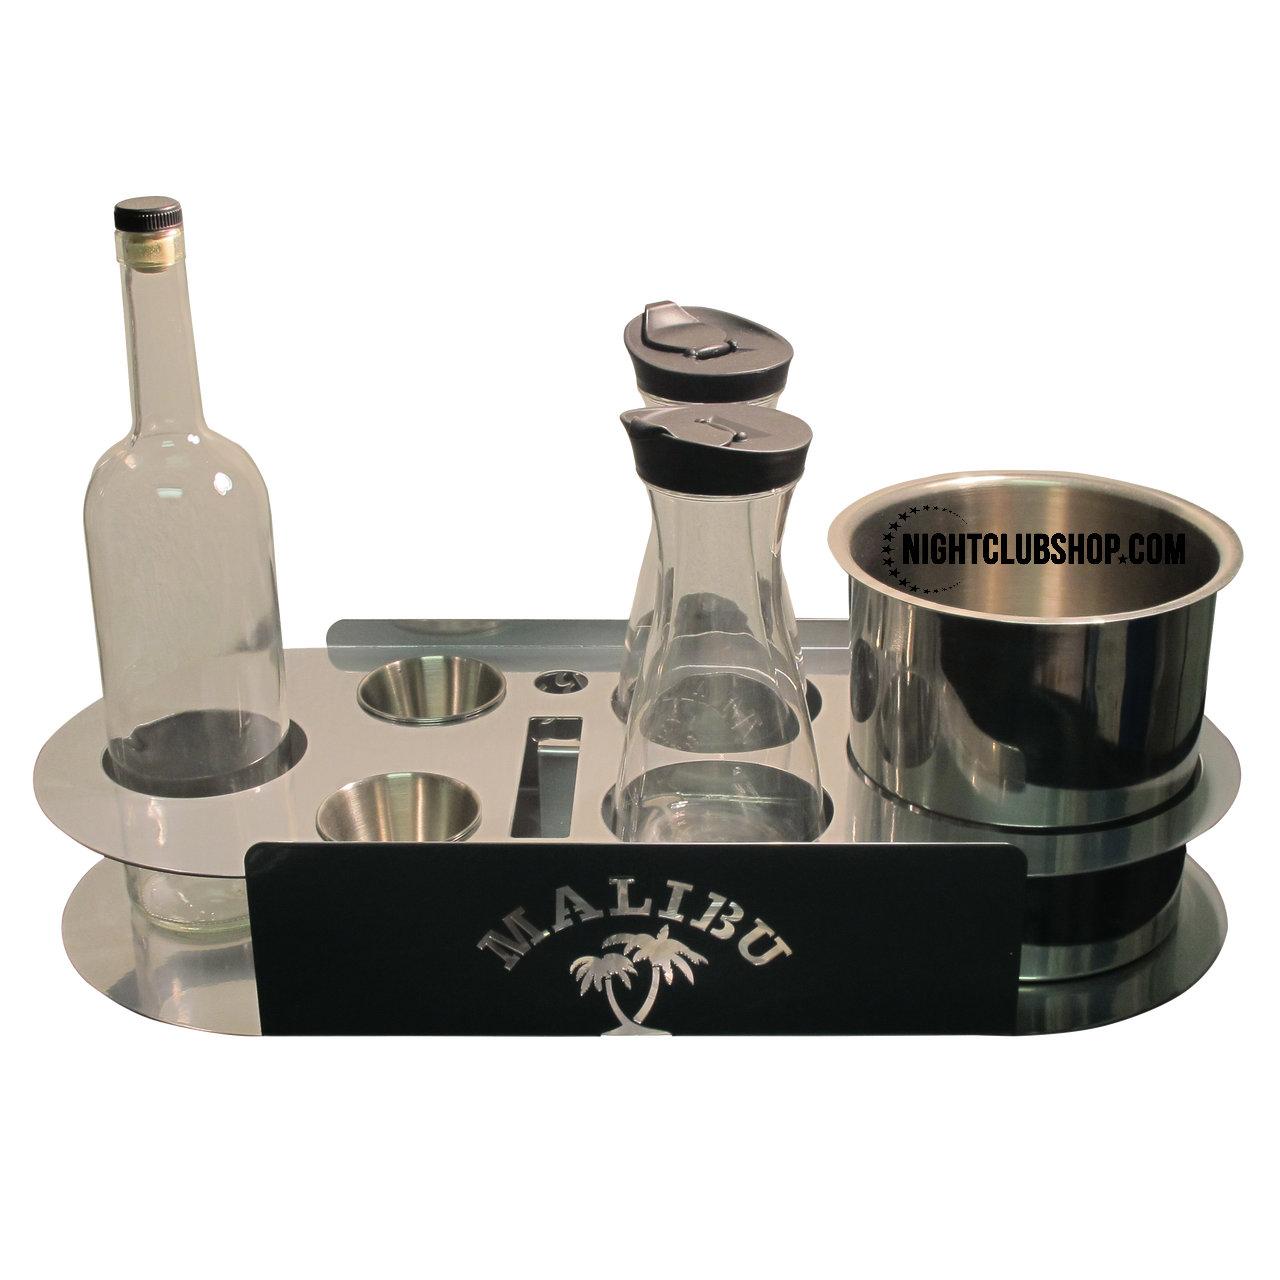 Custom, Logo, VIP, champagne, bottle, Service, tray, serving, branded,